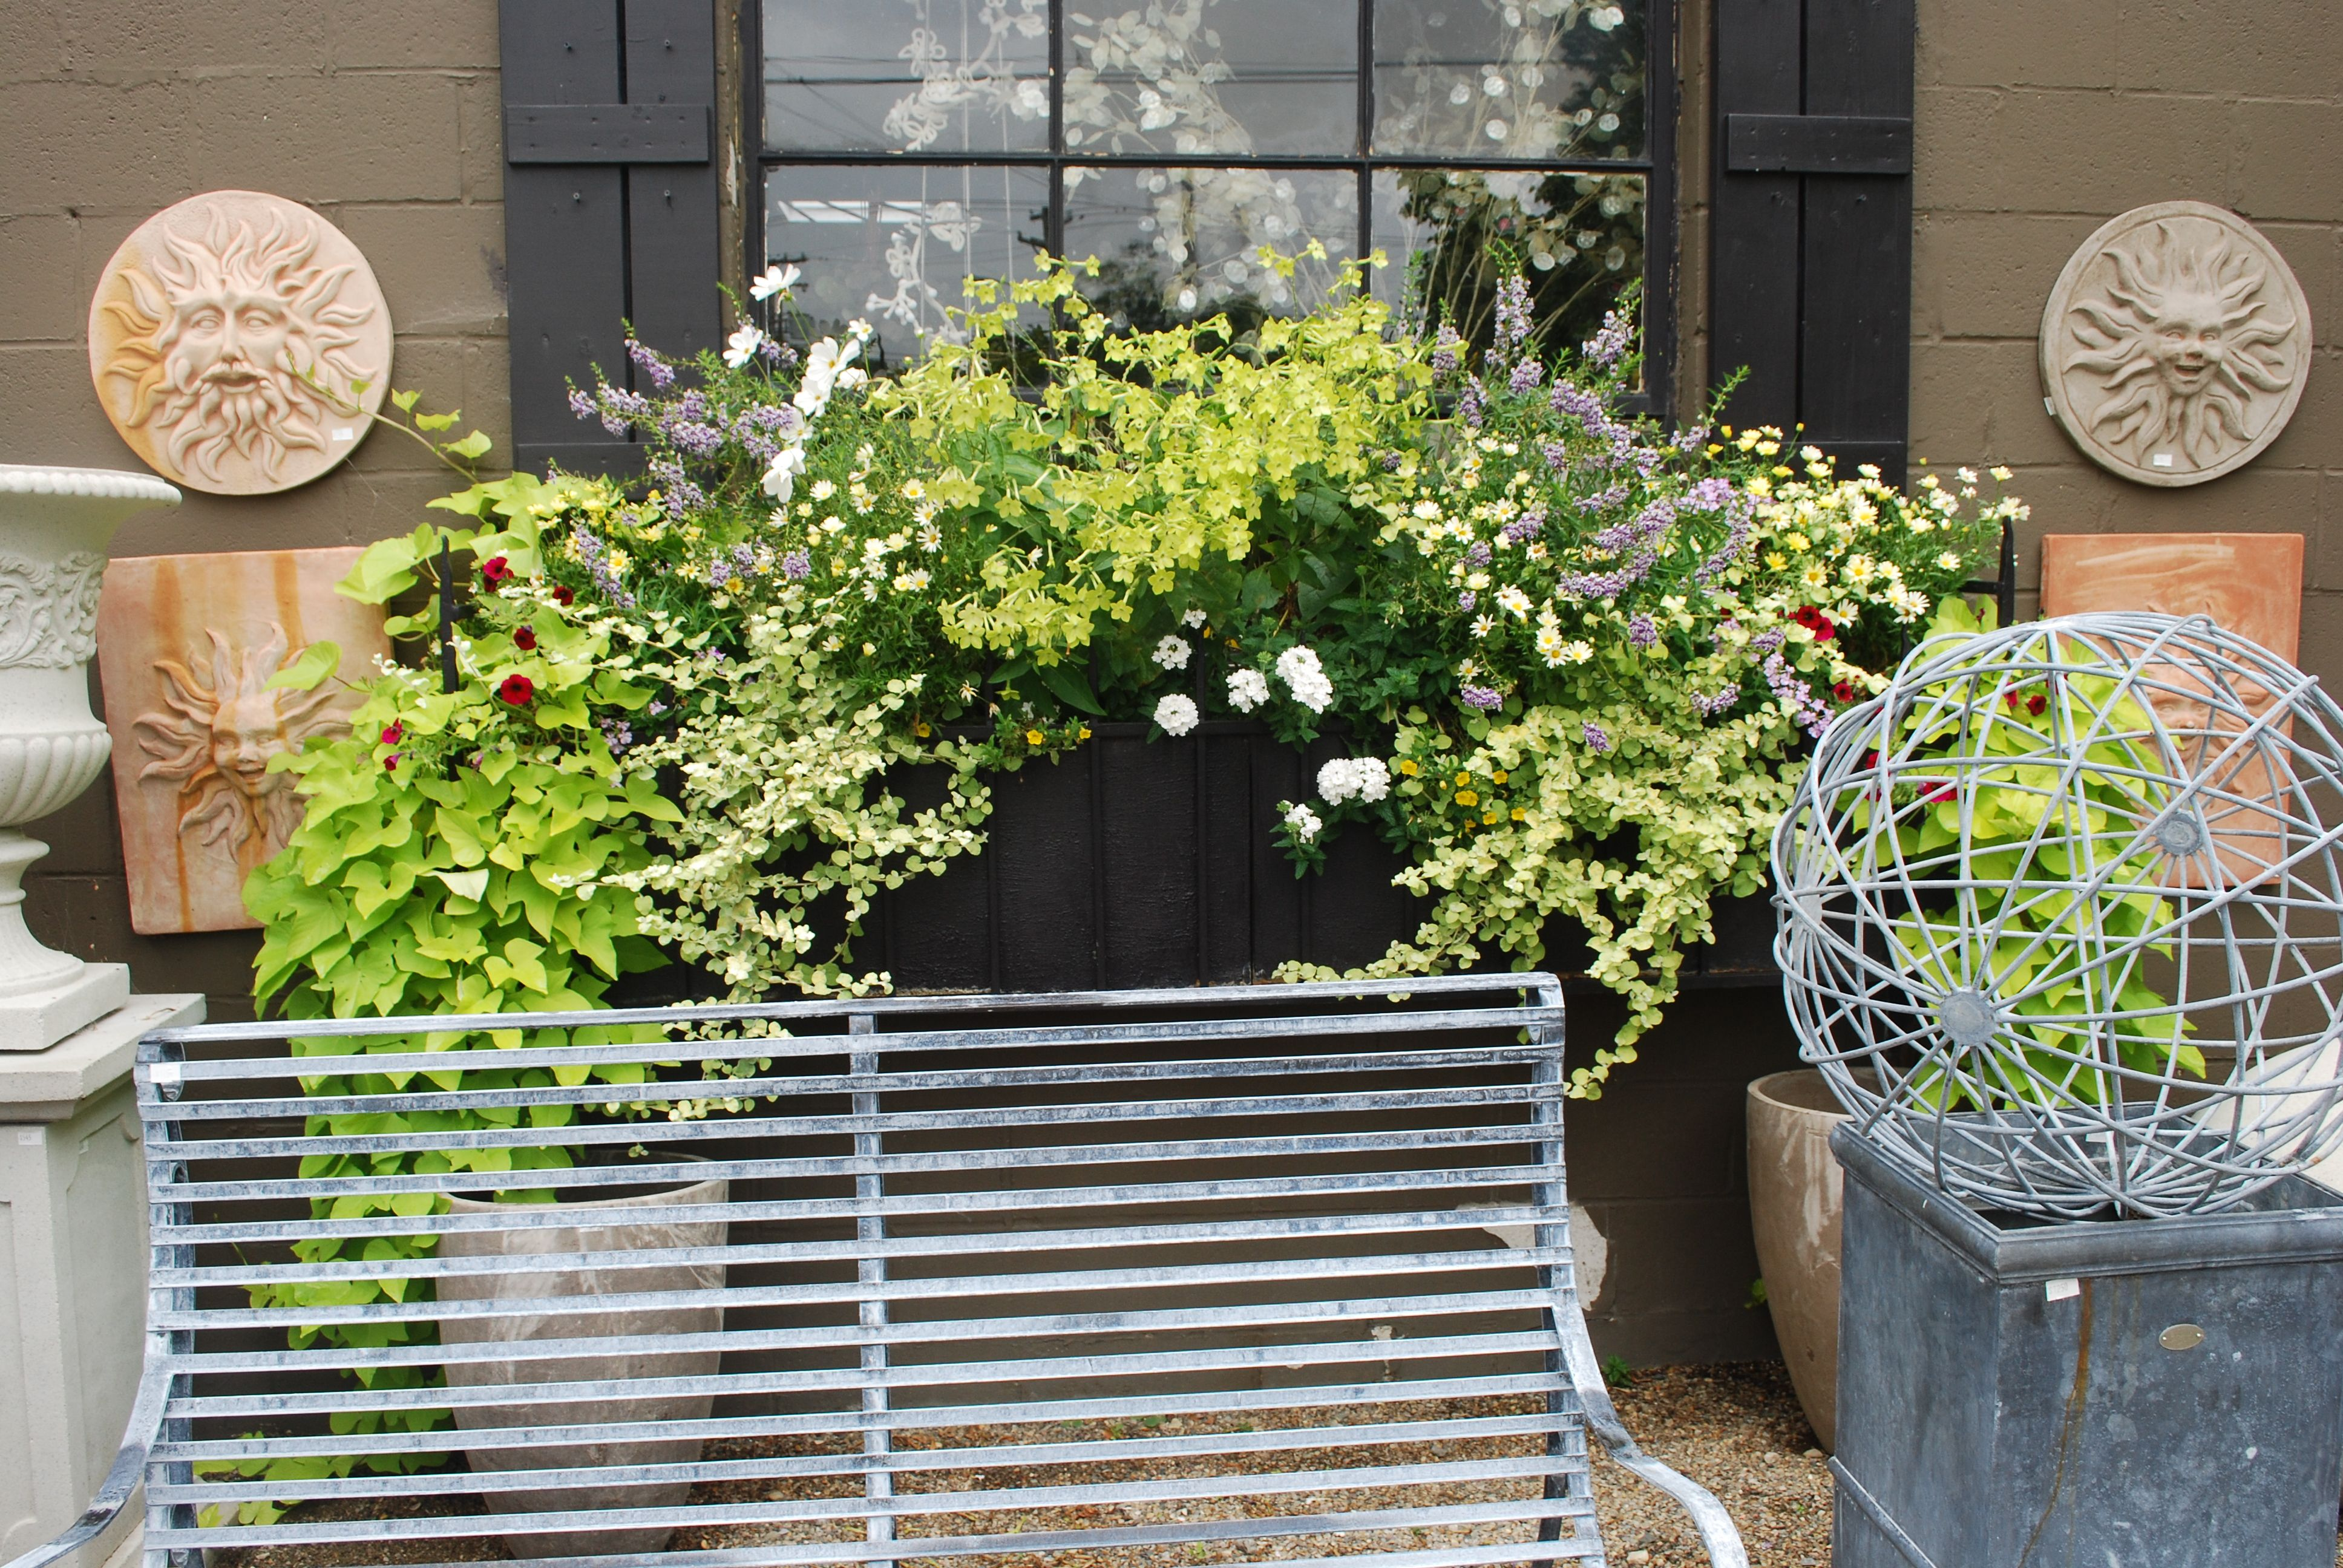 Window Box With Lime Nicotiana Window Box Window Boxes Outdoor Living